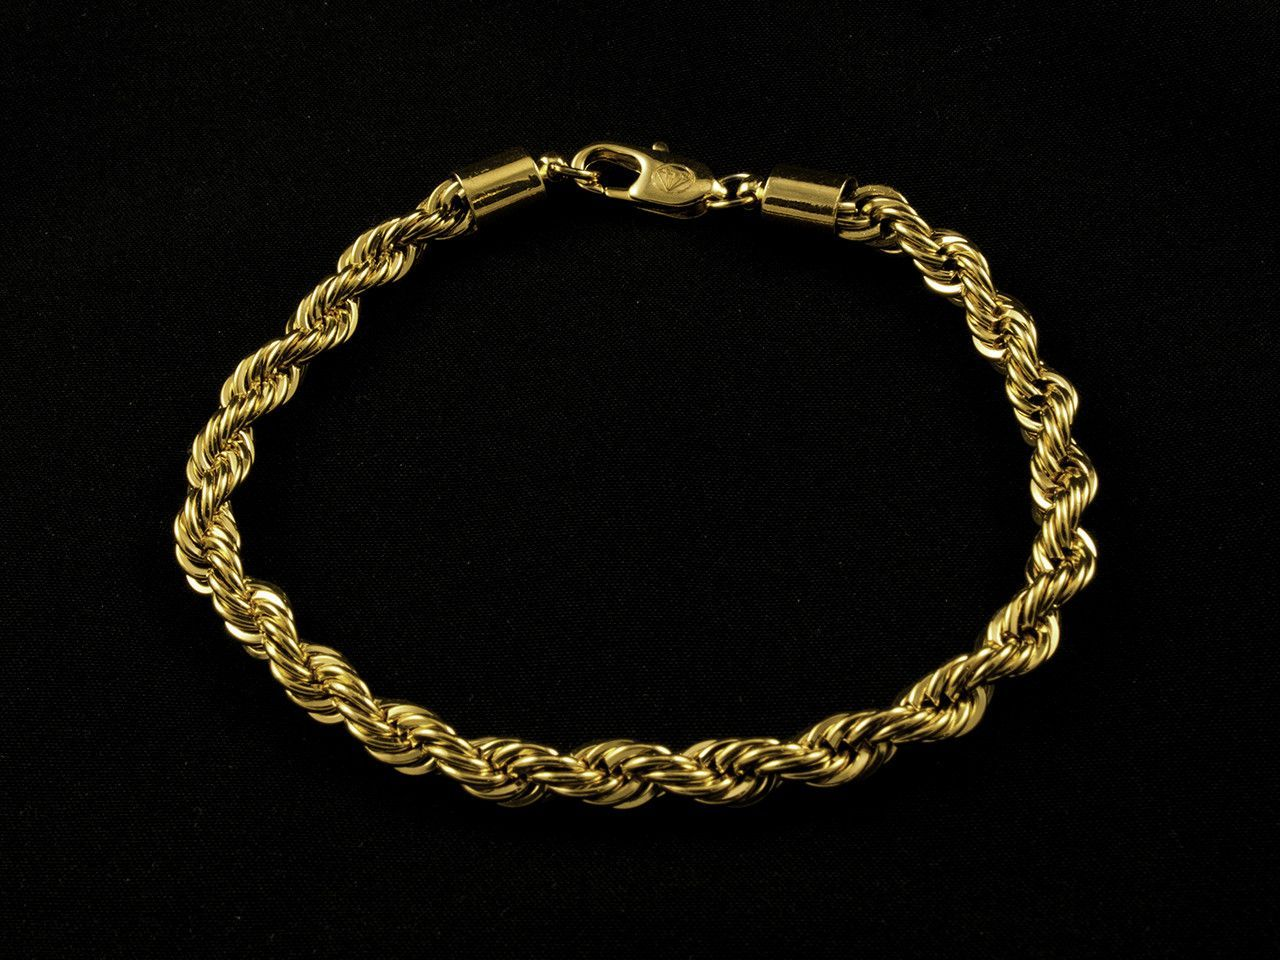 Mm gold rope bracelet gold bracelets pinterest products